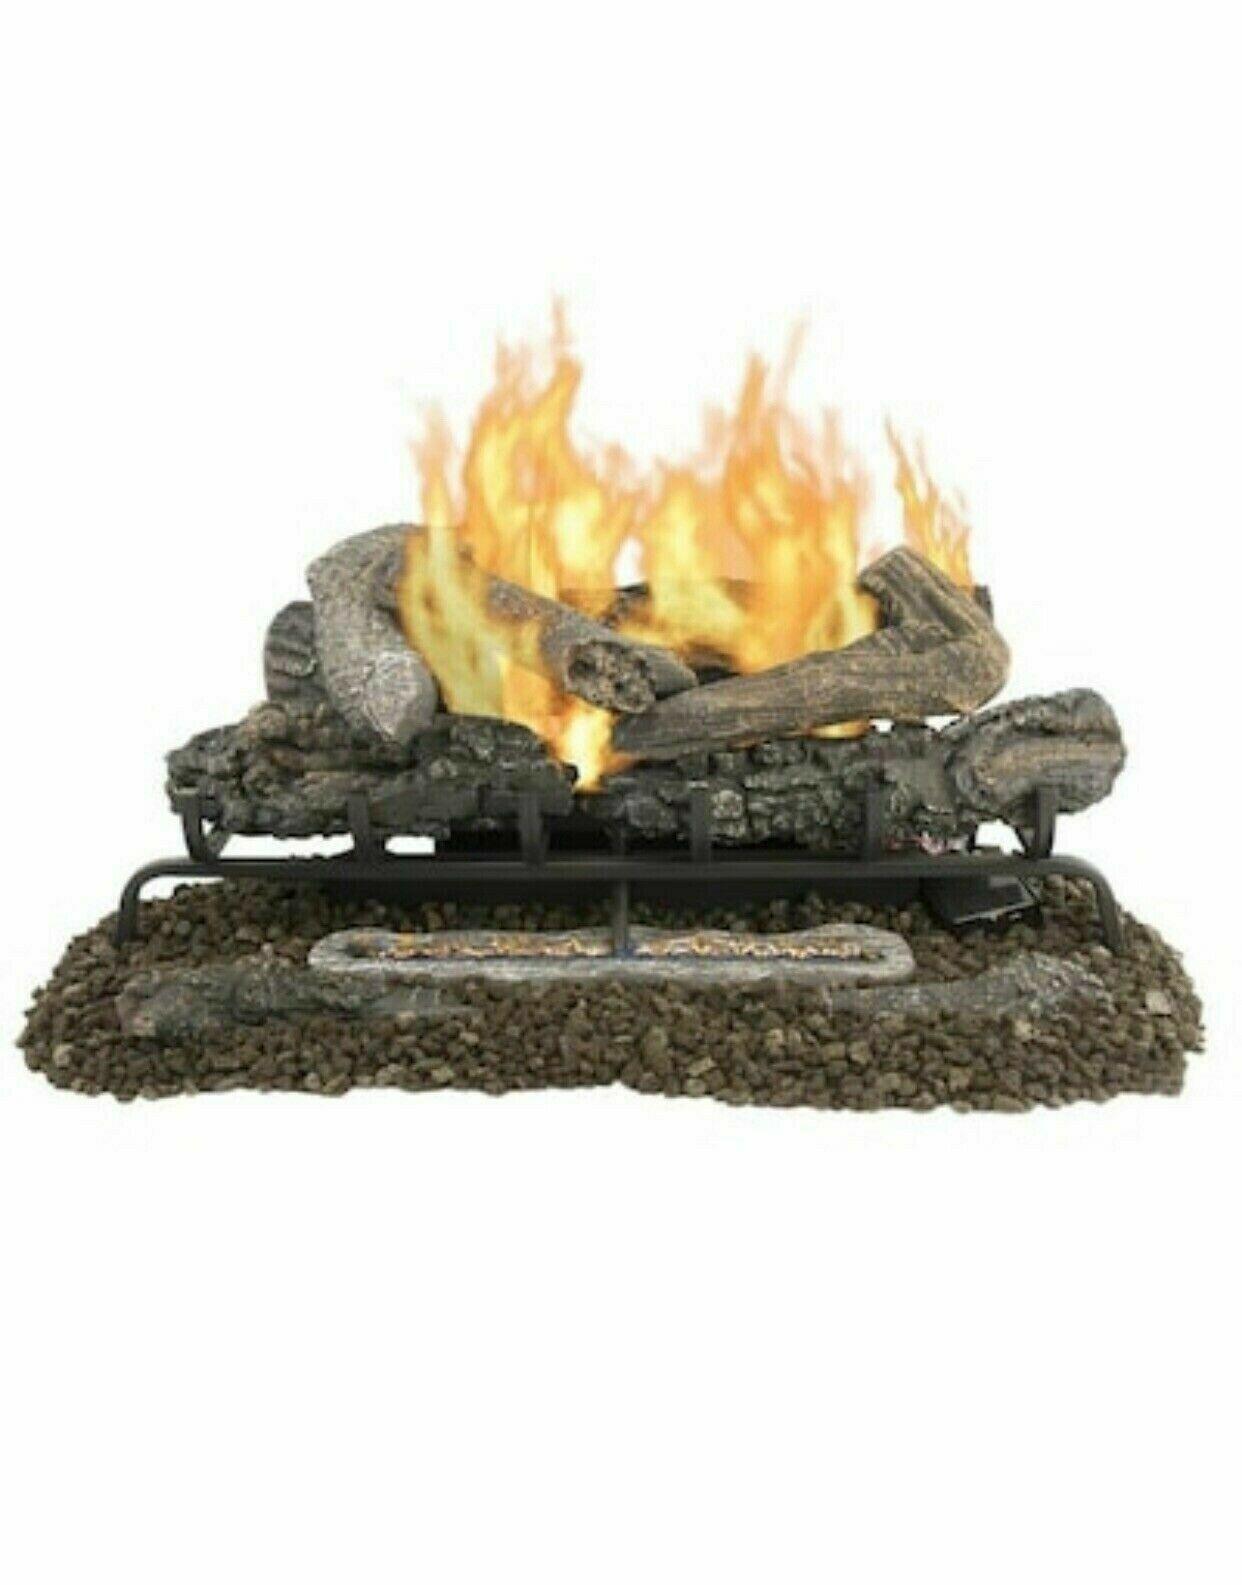 Dual Fuel Fireplace Luxury Pleasant Hearth 18 In Btu Dual Burner Vent Free Gas Fireplace Logs